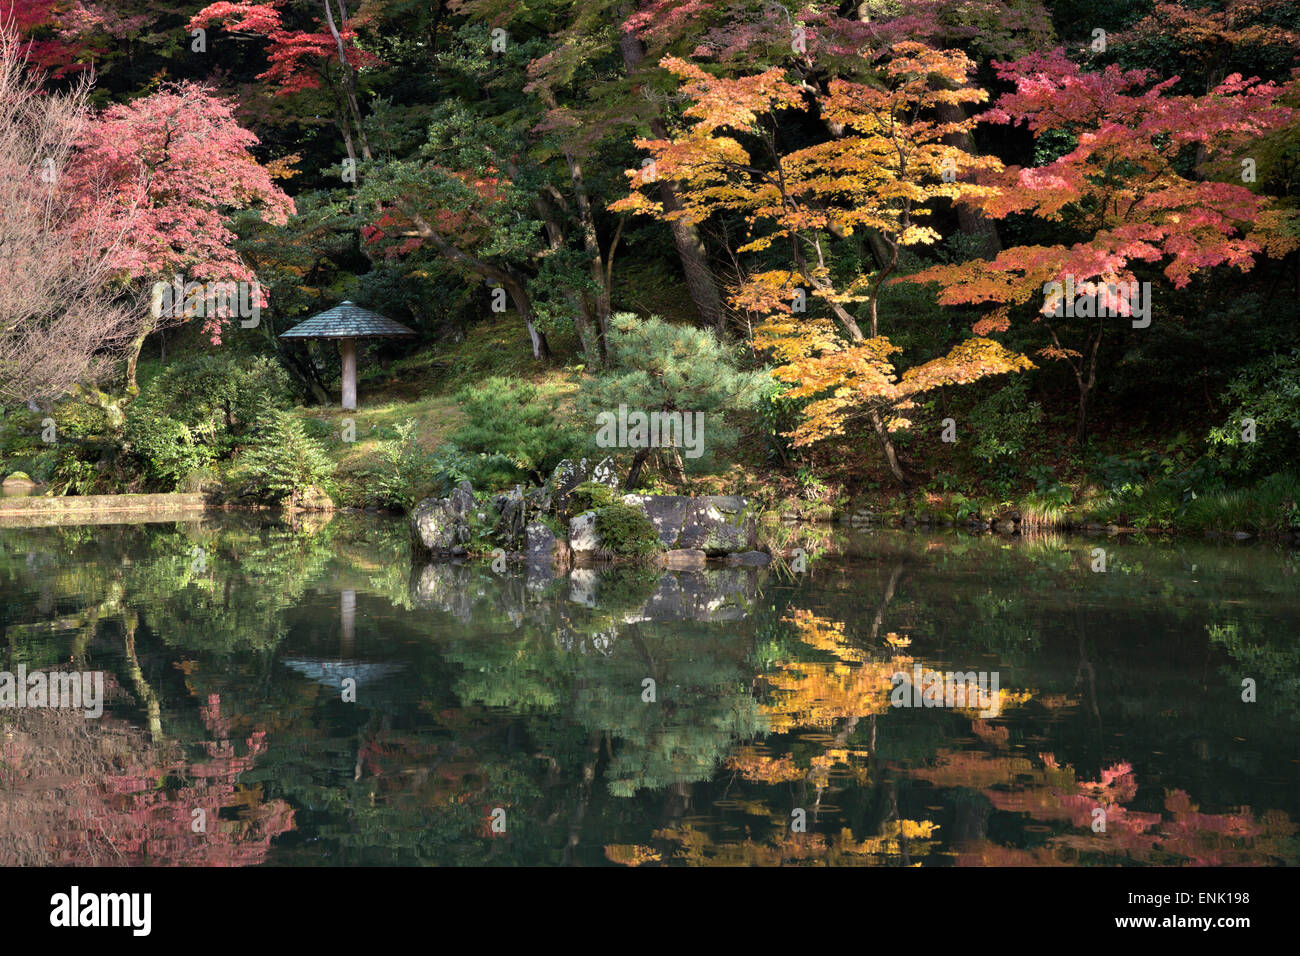 Couleurs de l'automne reflète dans Hisagoike étang, jardin Kenrokuen, Kanazawa, Ishikawa Prefecture, Photo Stock